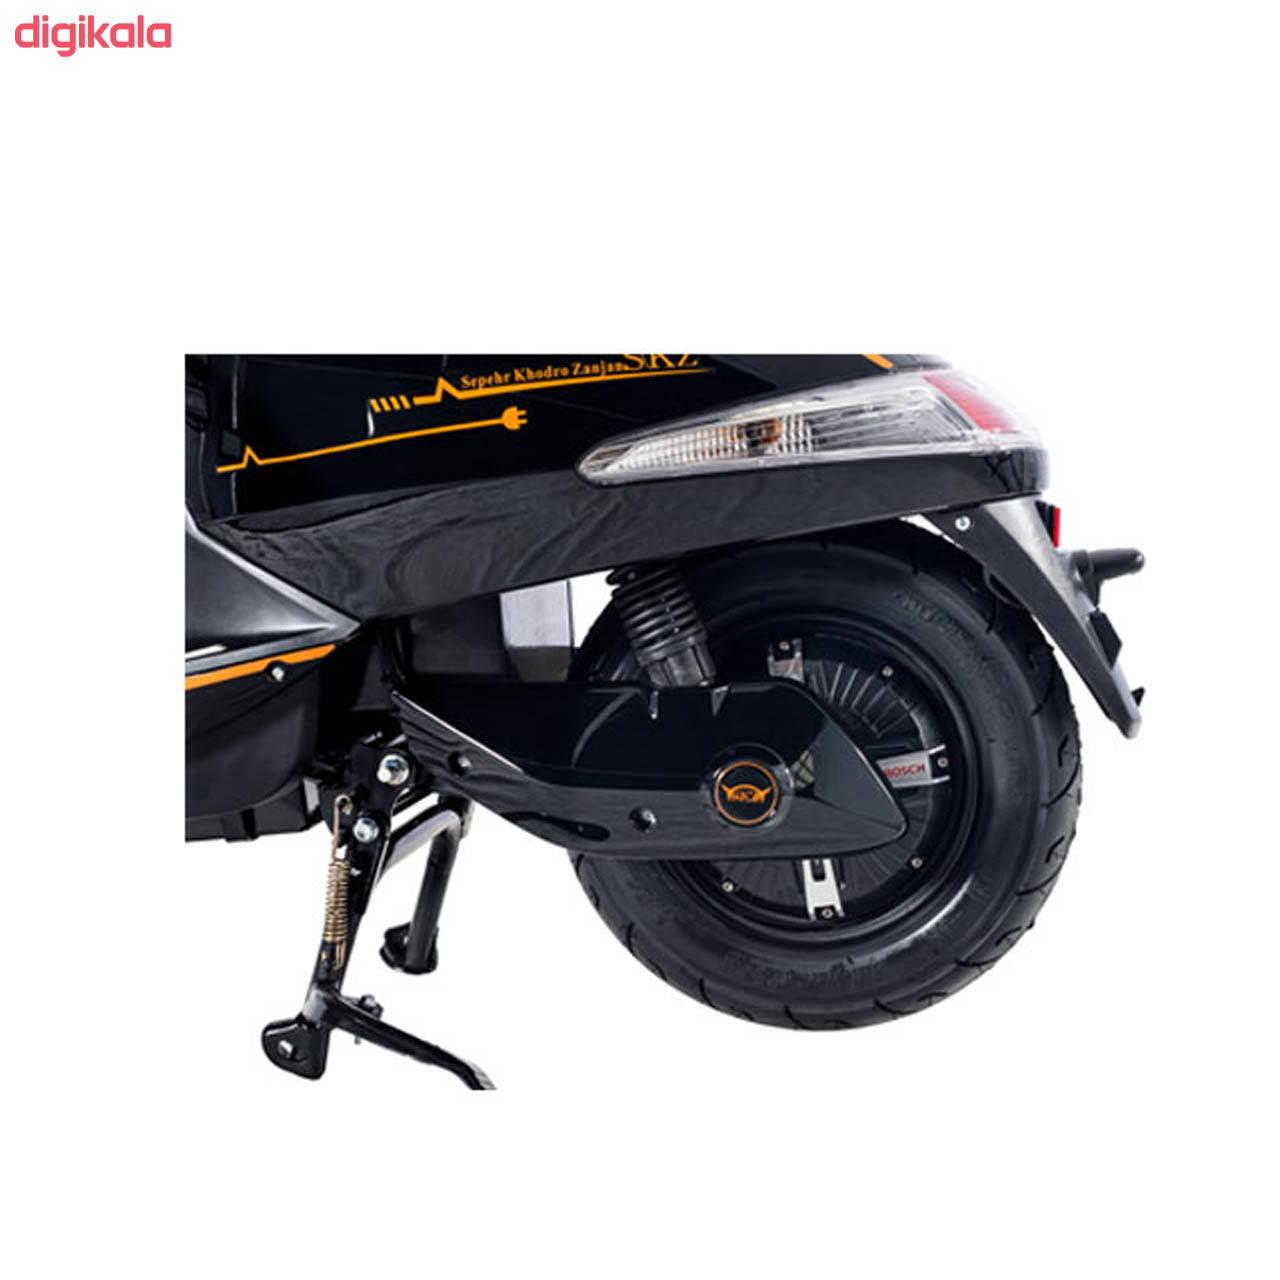 موتورسیکلت سپهر مدل 1600SKZ وات سال 1399 main 1 5